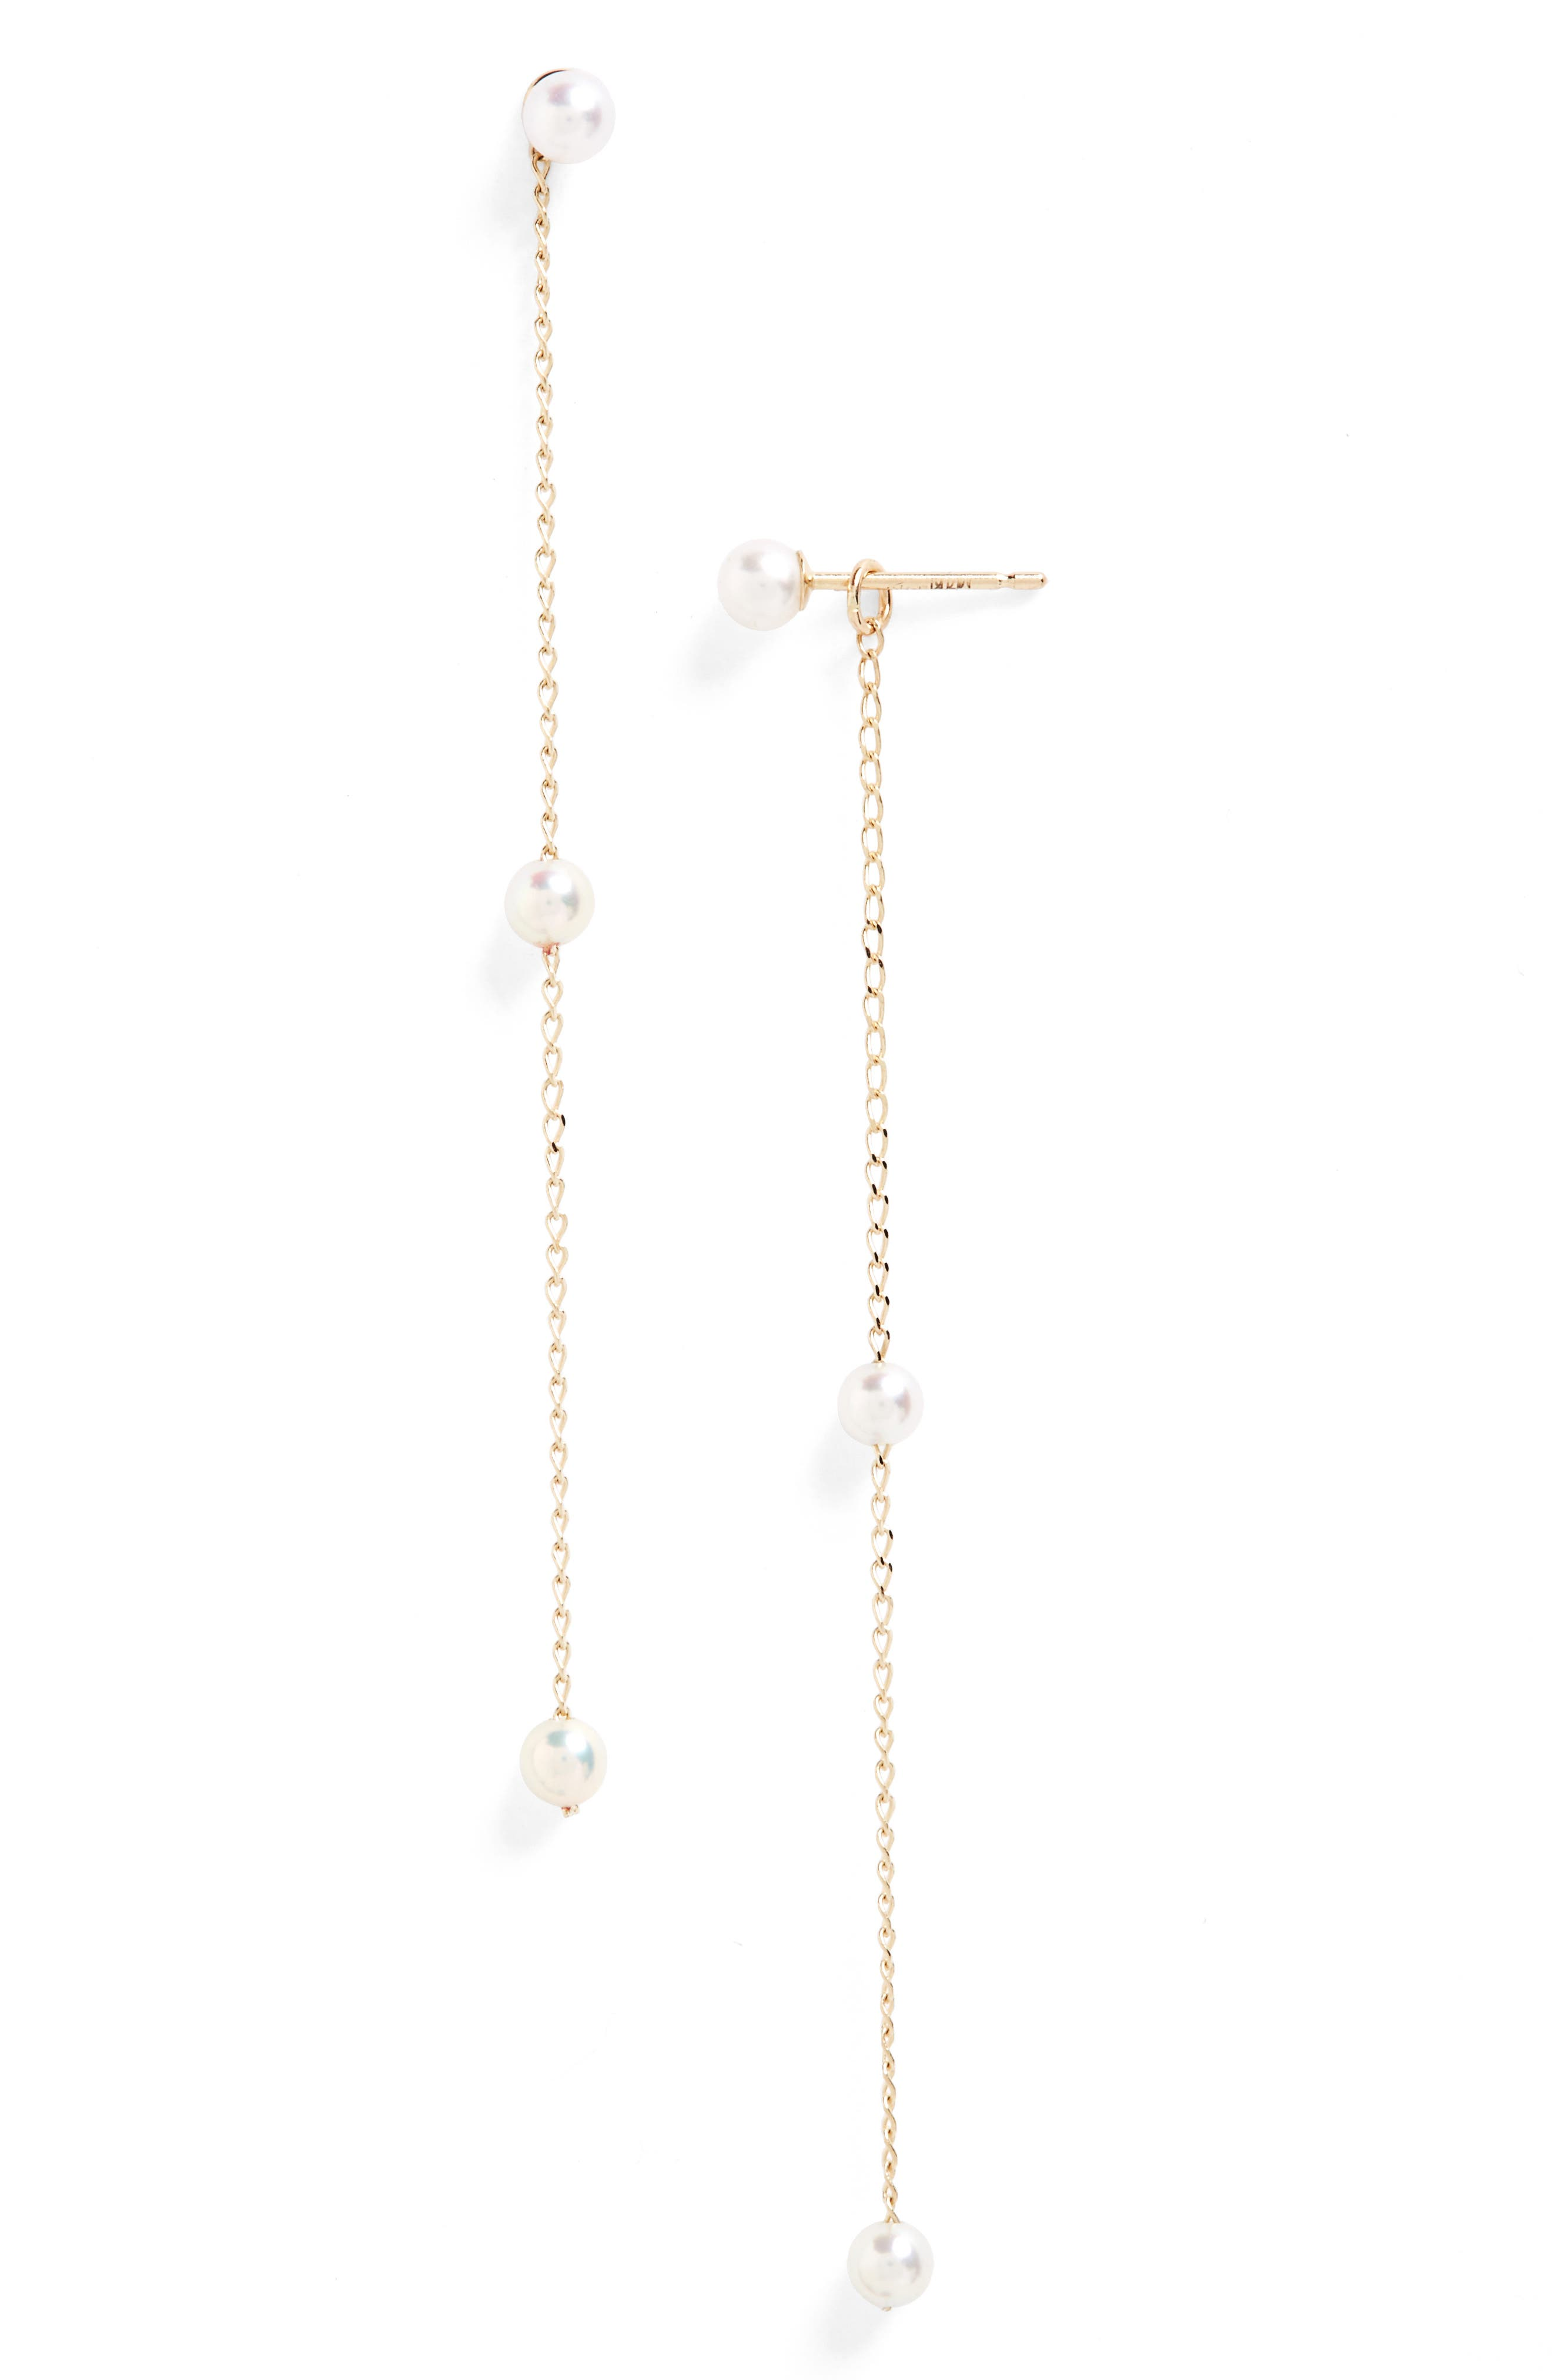 Sea of Beauty Pearl Convertible Drop Earrings,                             Main thumbnail 1, color,                             YELLOW GOLD/ WHITE PEARL